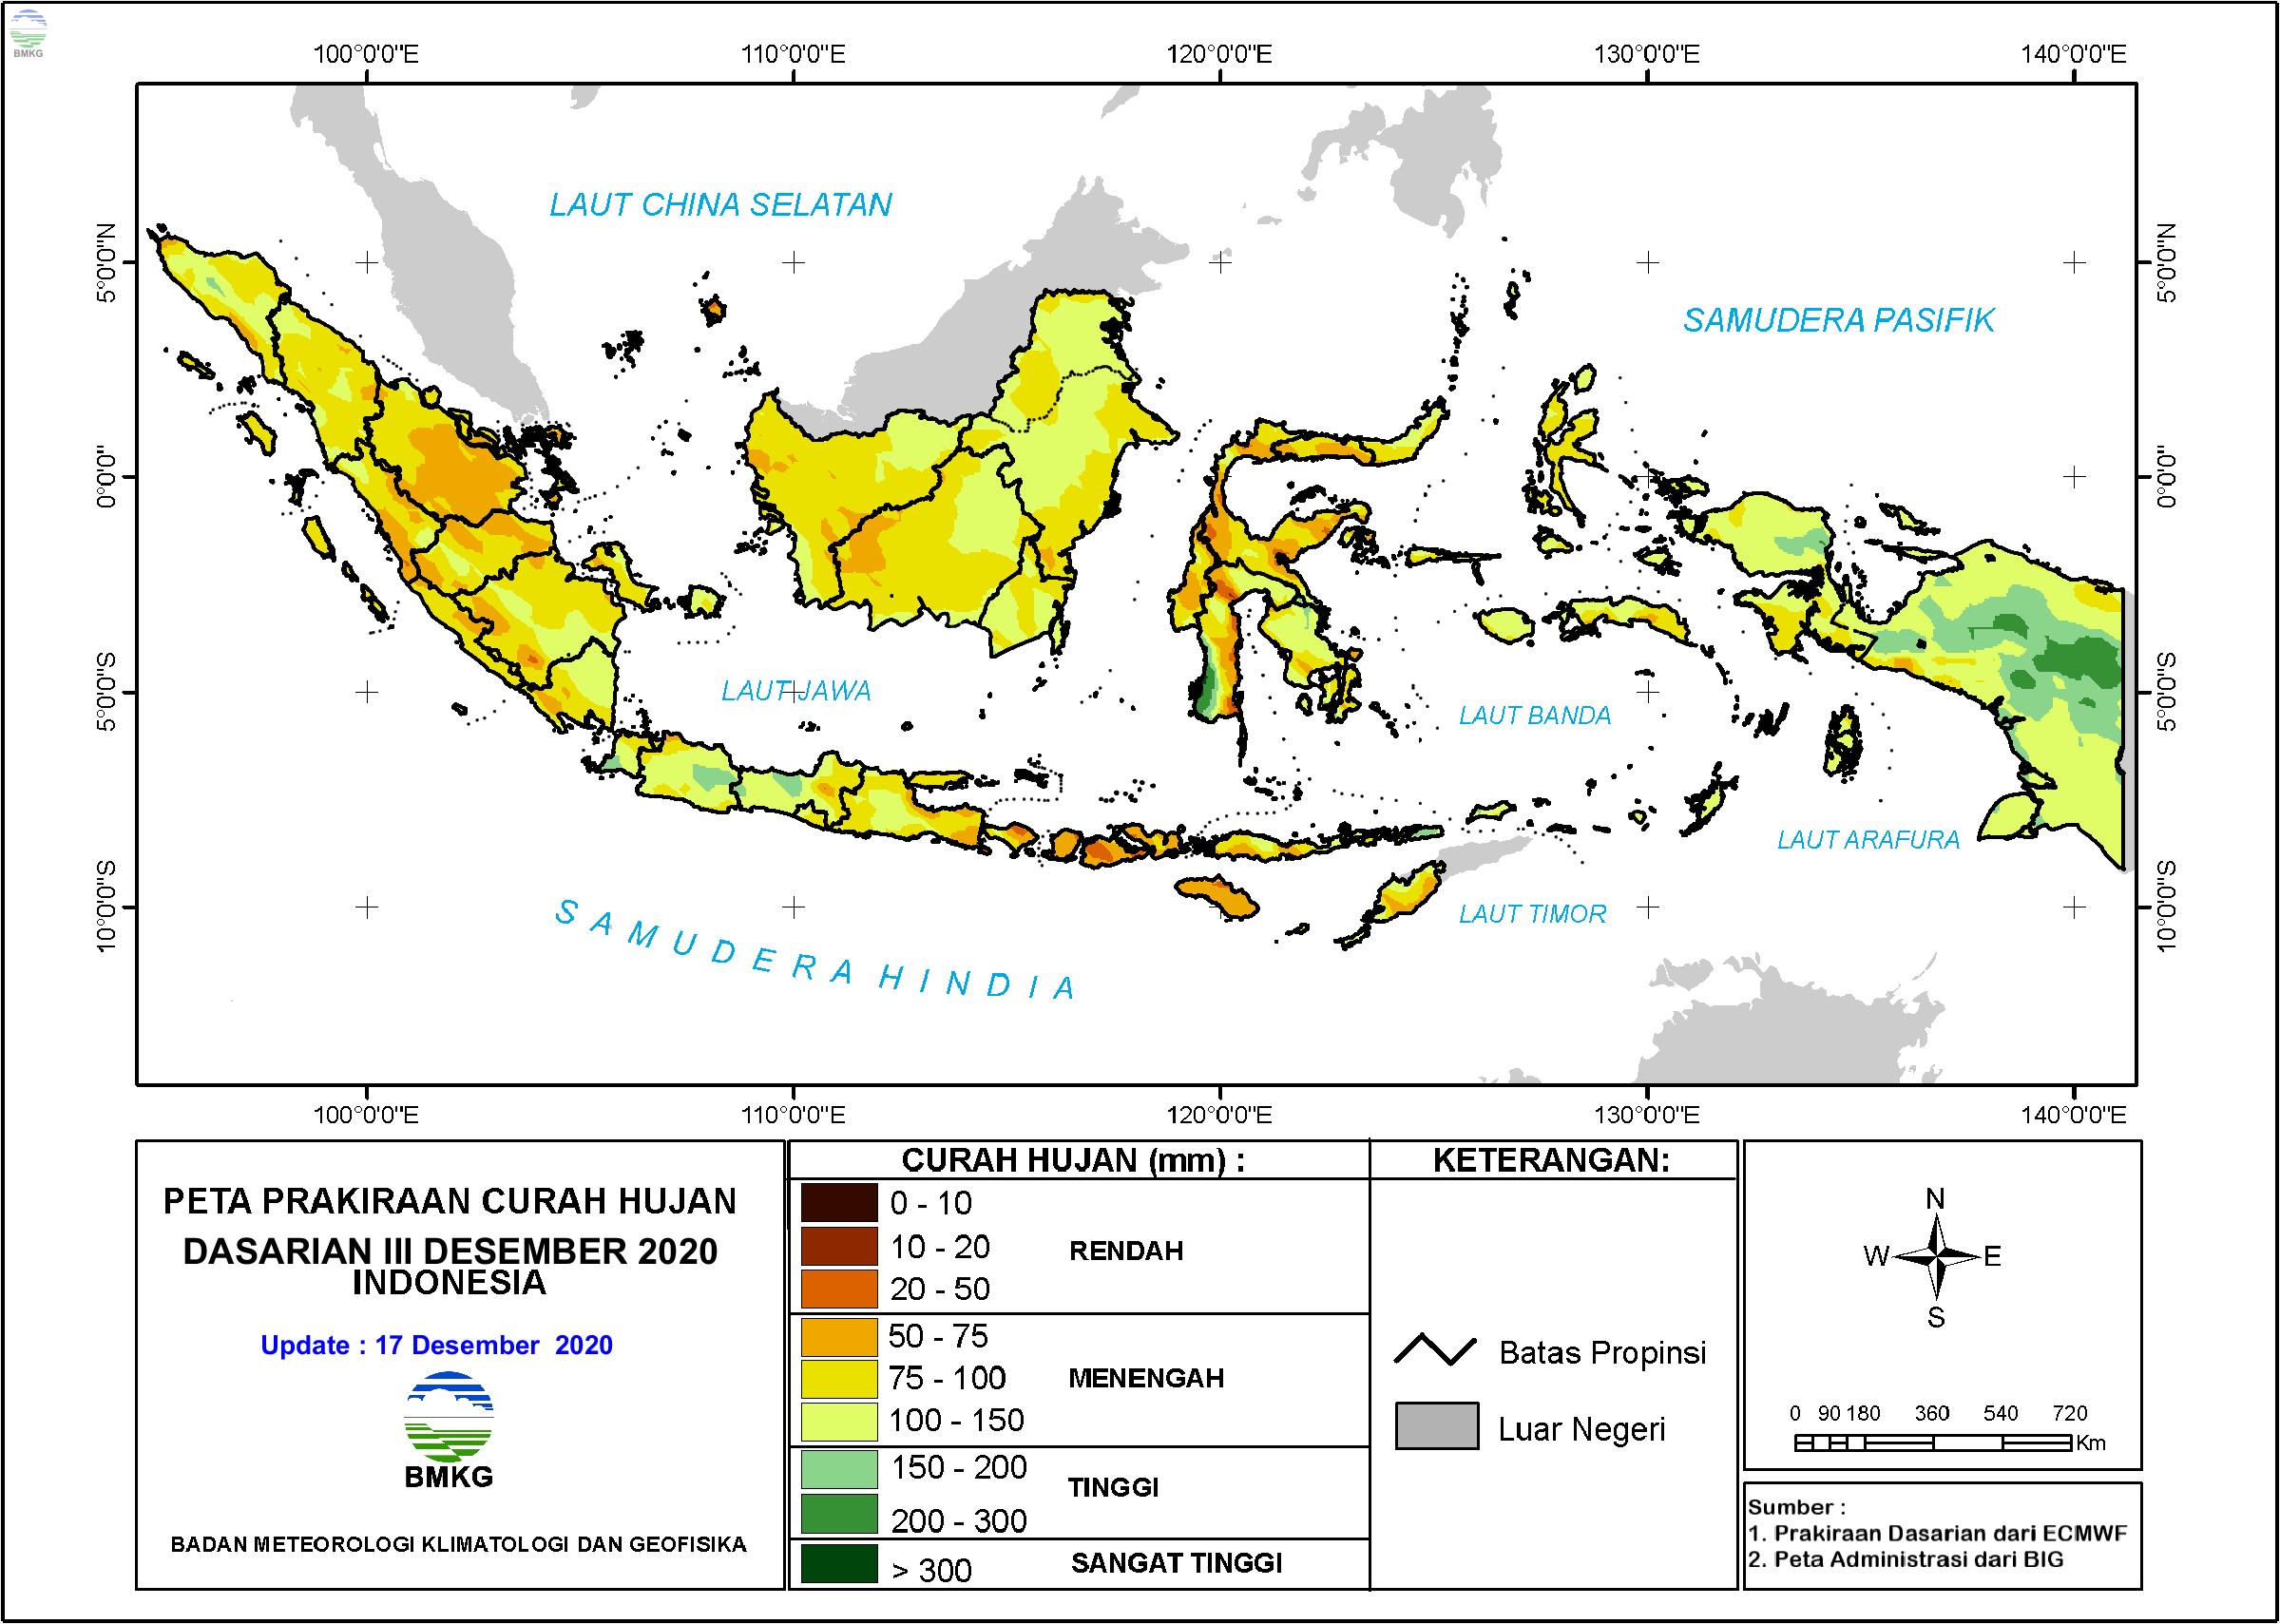 Prakiraan Curah Hujan Dasarian III Desember 2020 dan I-II Januari 2021